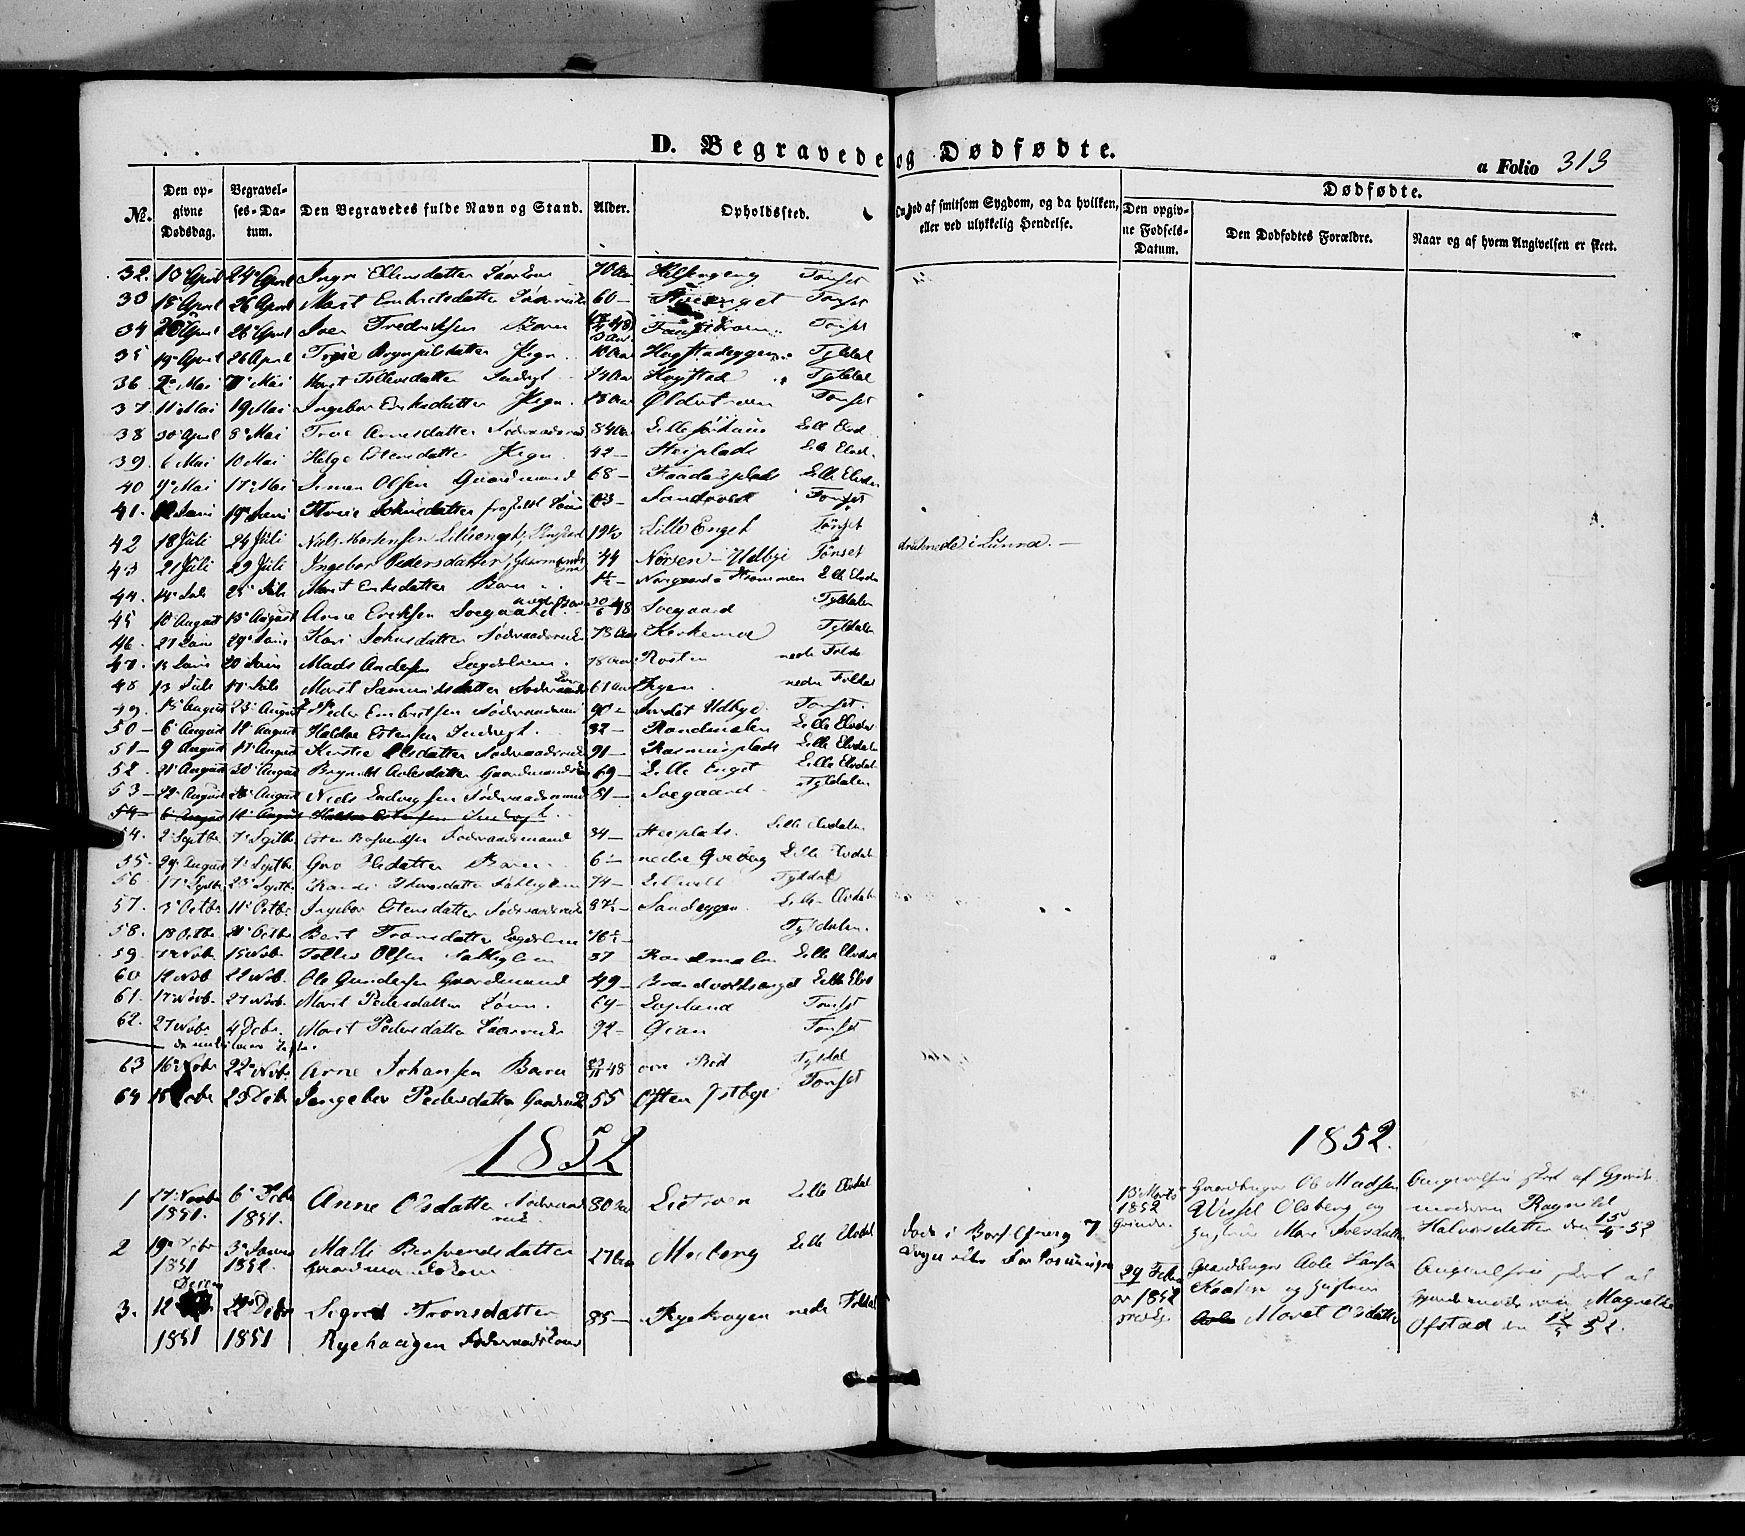 SAH, Tynset prestekontor, Ministerialbok nr. 20, 1848-1862, s. 313